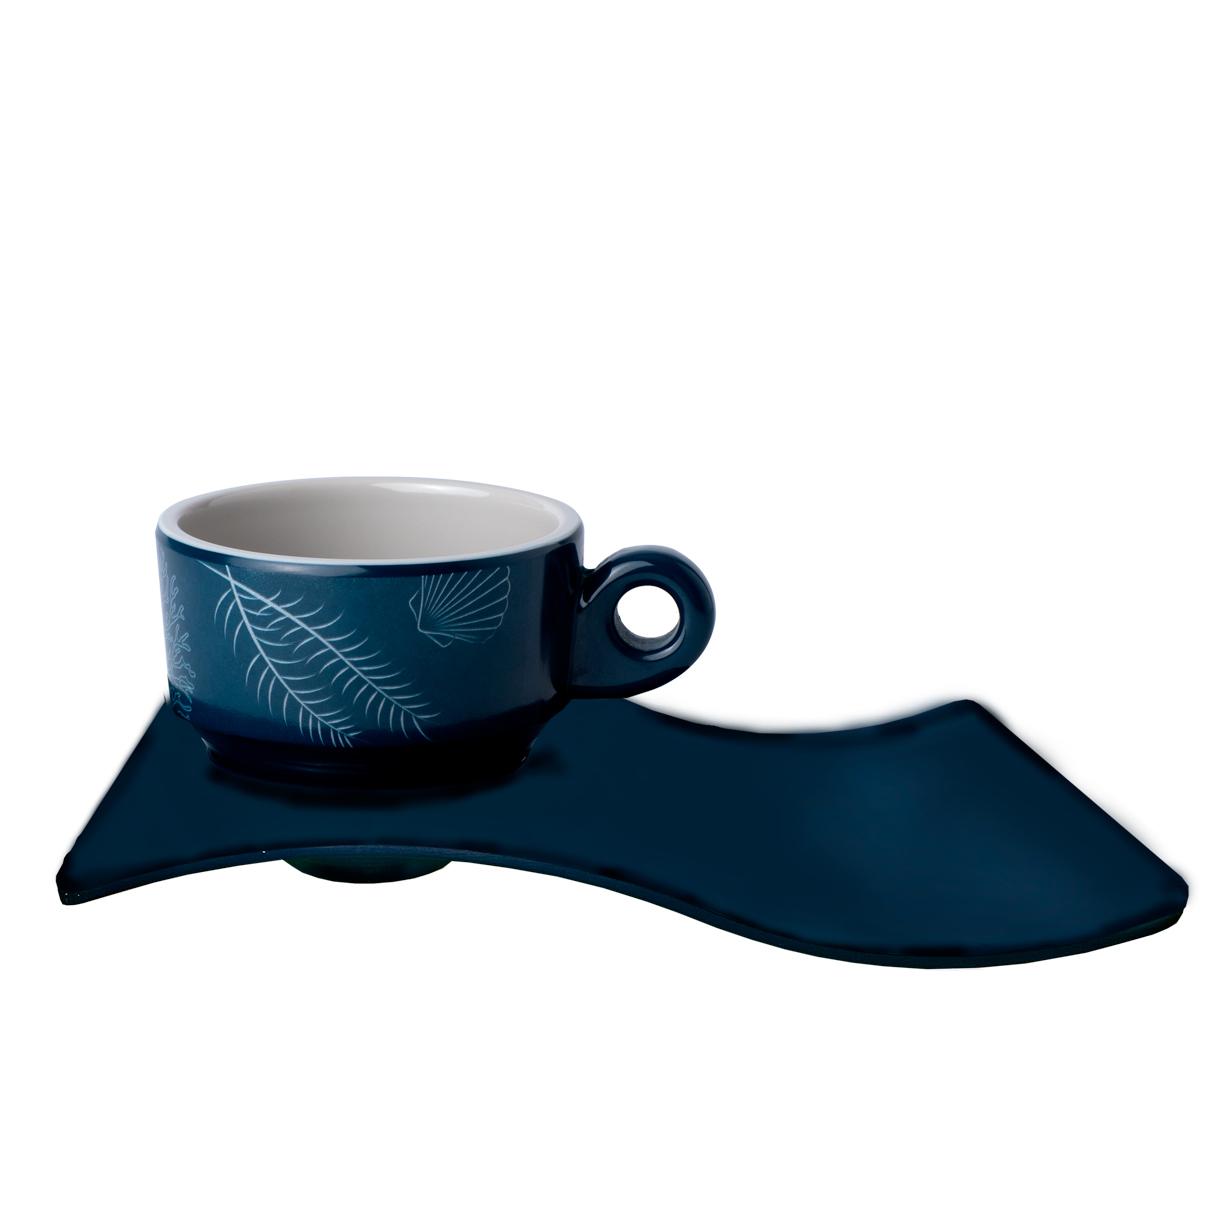 Melamine coffee set, Living, 6 un